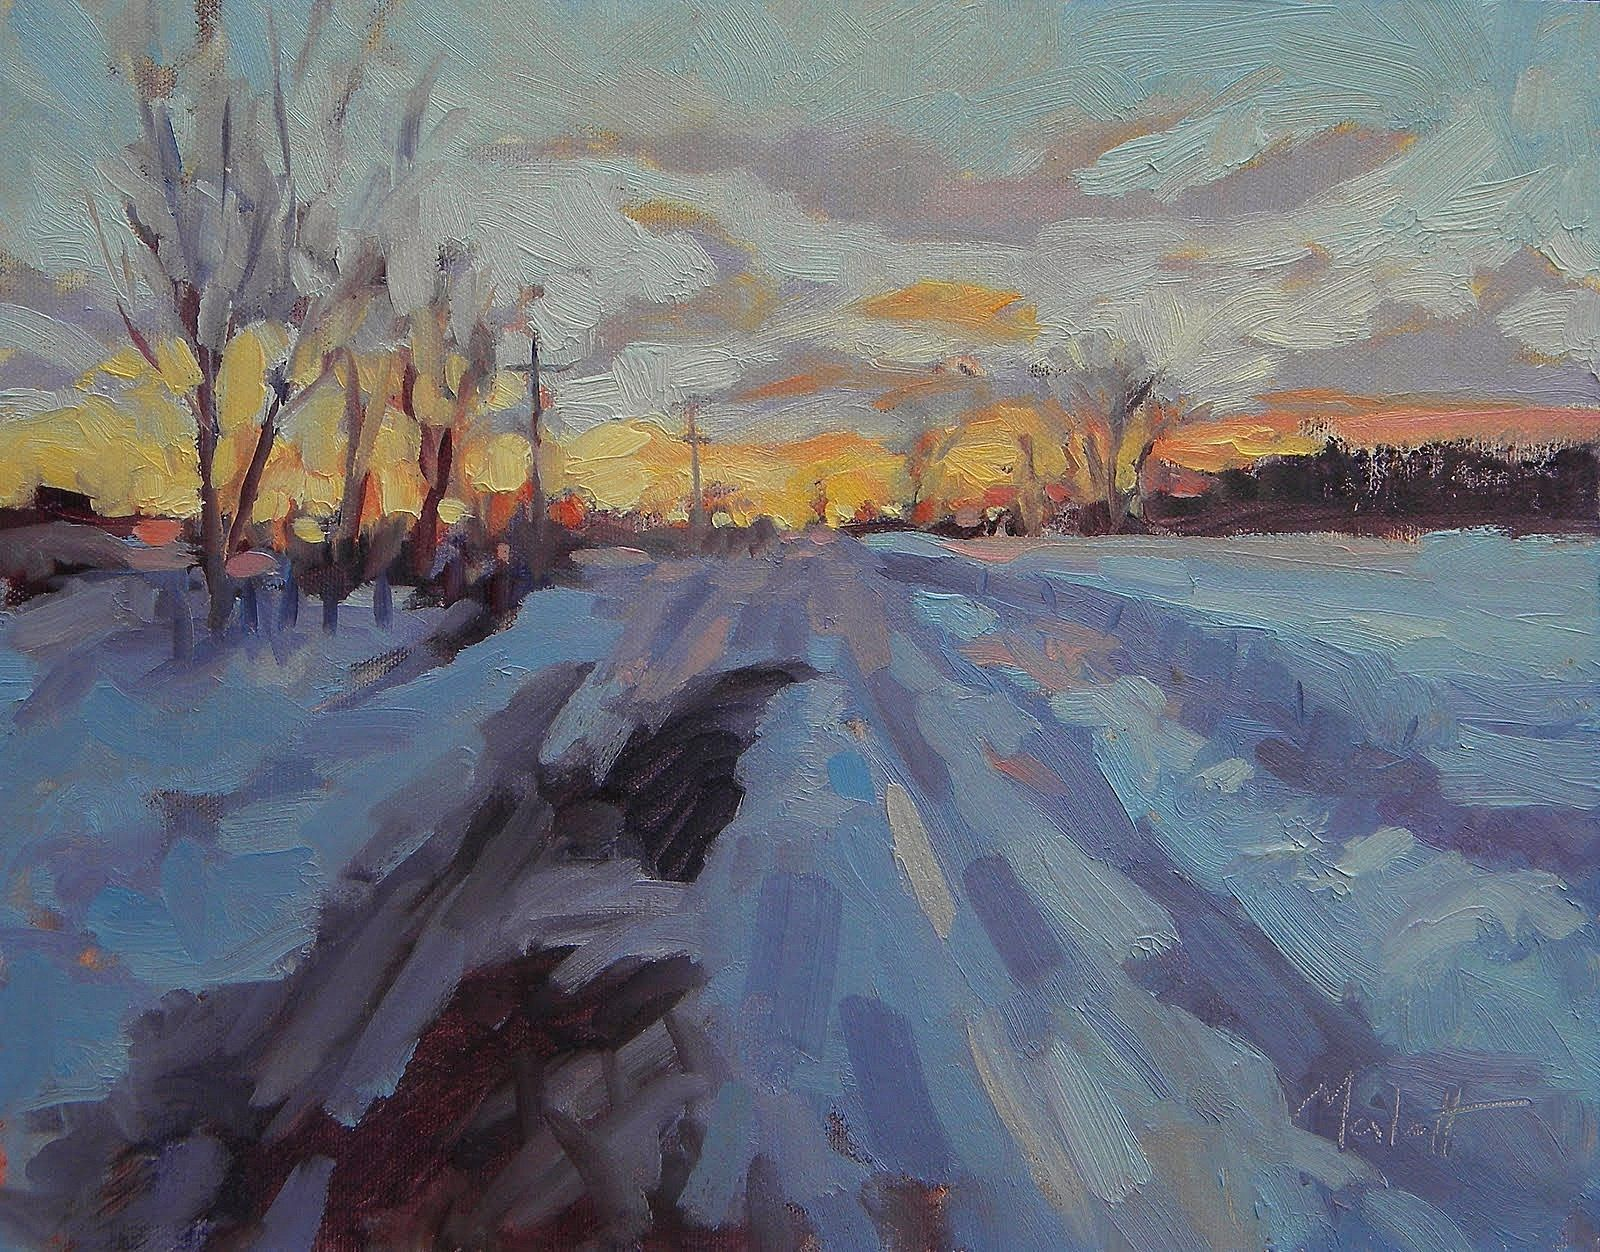 Sunset Winter Landscape 11 X14 Snow Impressionism Contemporary Clouds Oil Painting Winter Landscape Oil Painting Landscape Winter Painting